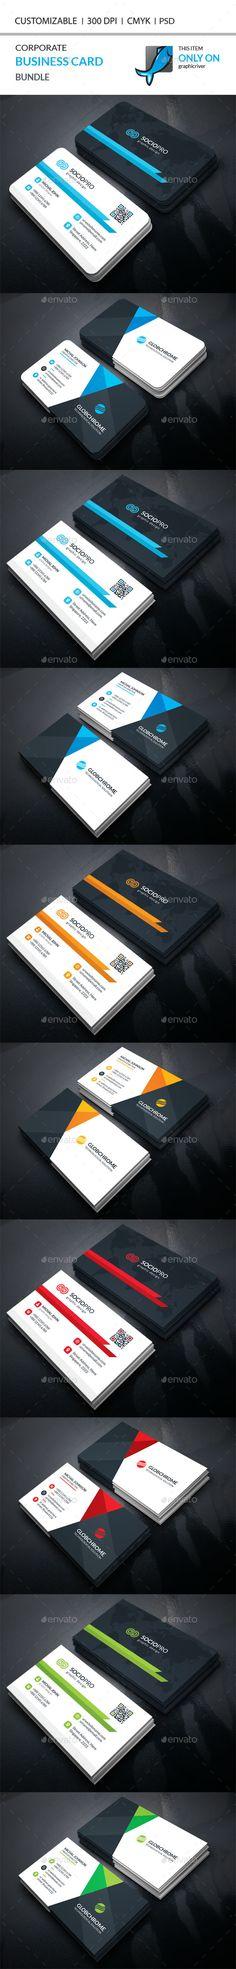 Corporate Business Card Bundle Templates PSD. Download here: http://graphicriver.net/item/corporate-business-card-bundle/16447487?ref=ksioks